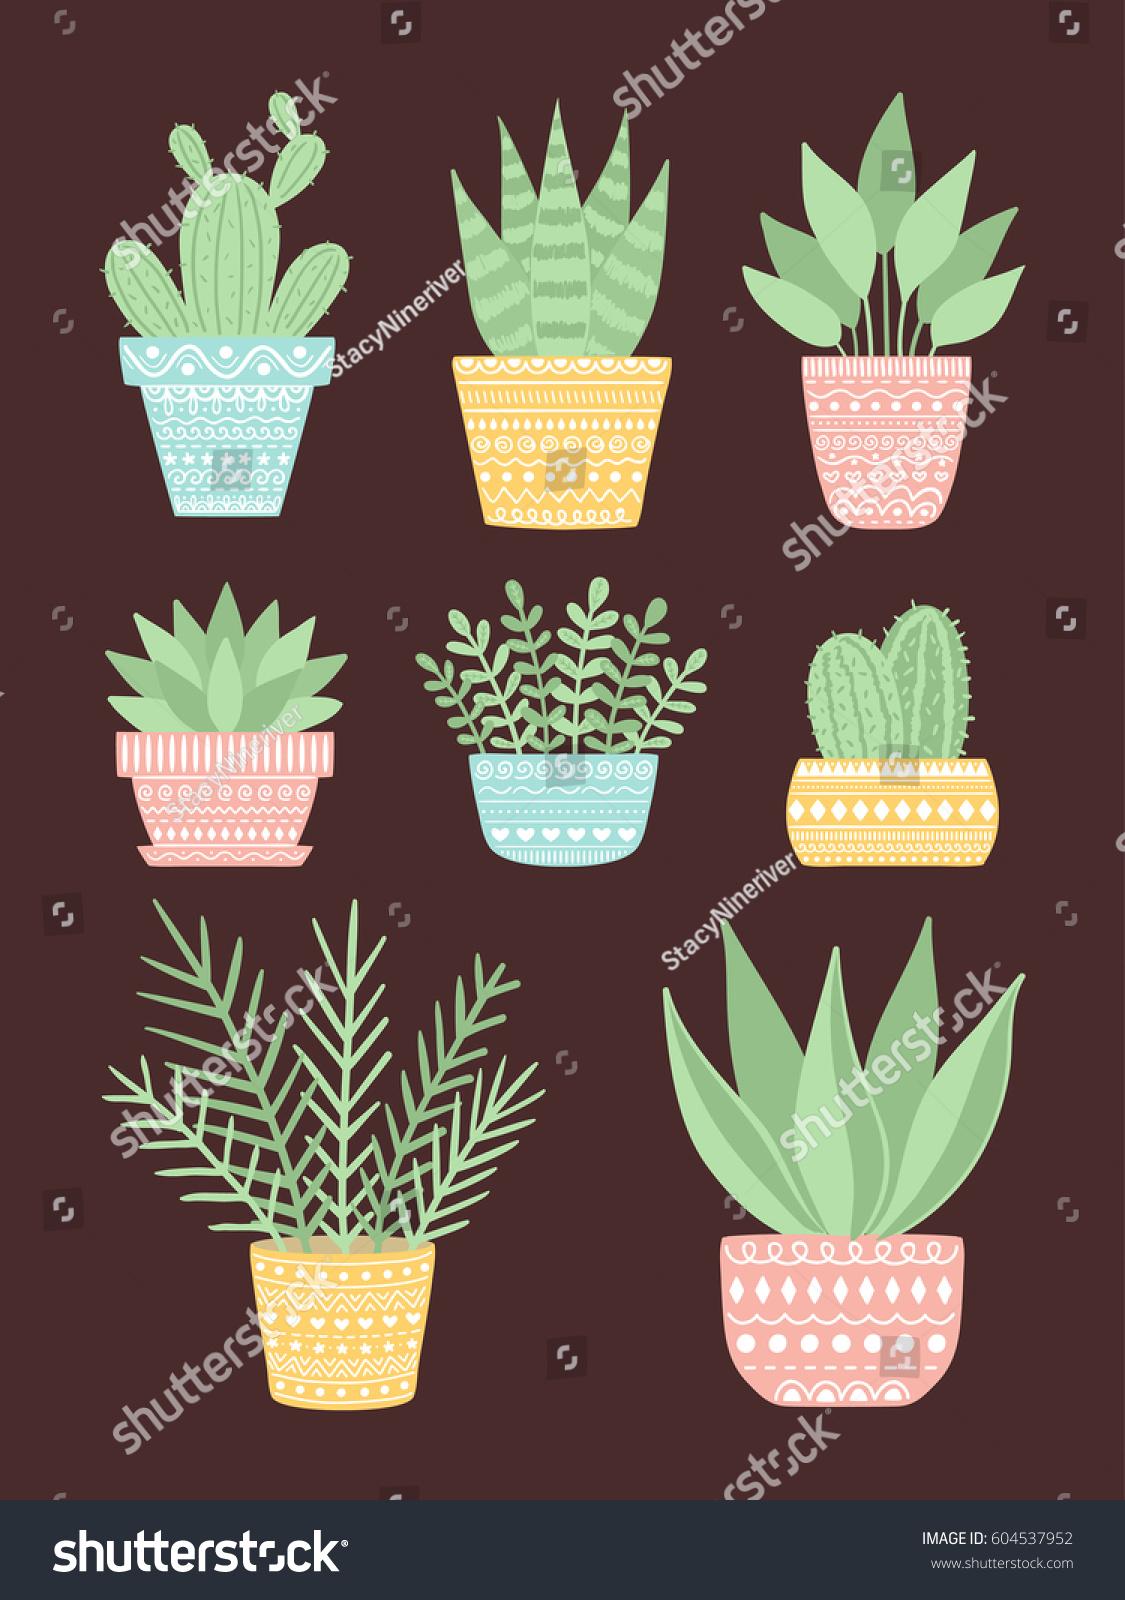 decorative handmade interior green plants original decor for deeper pots artistic